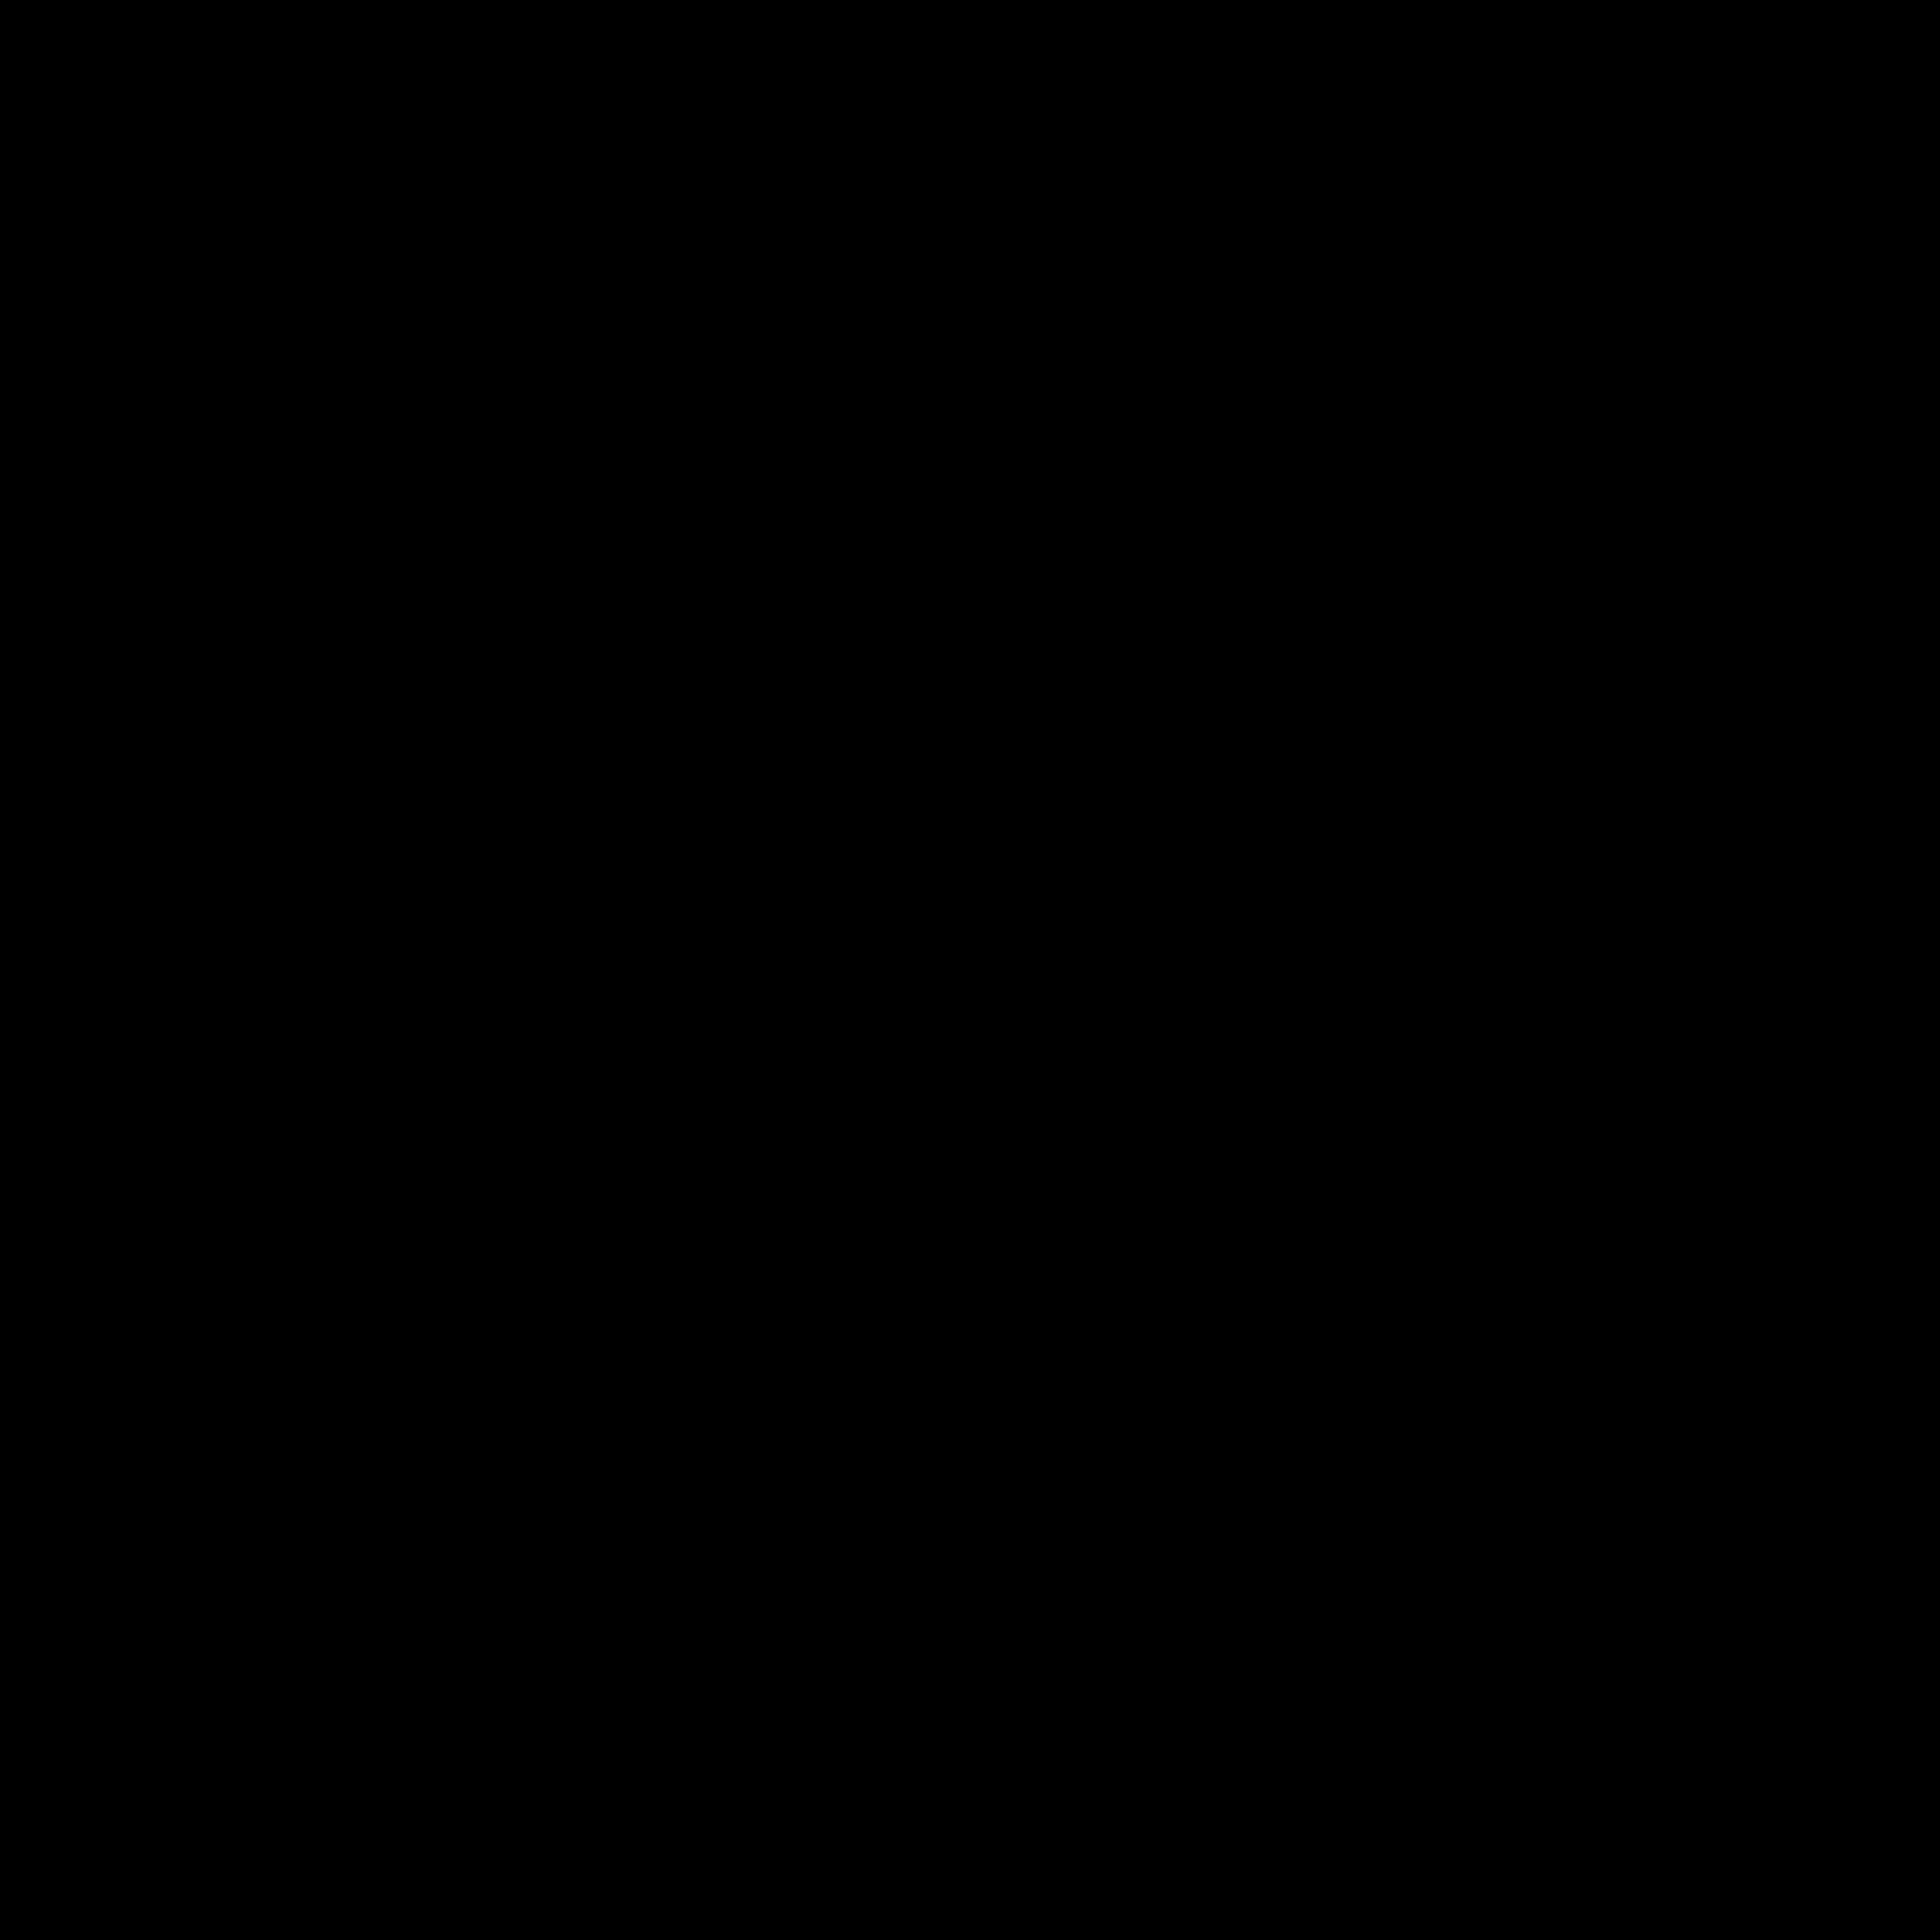 Cross pattée - Wikipedia jpg library library